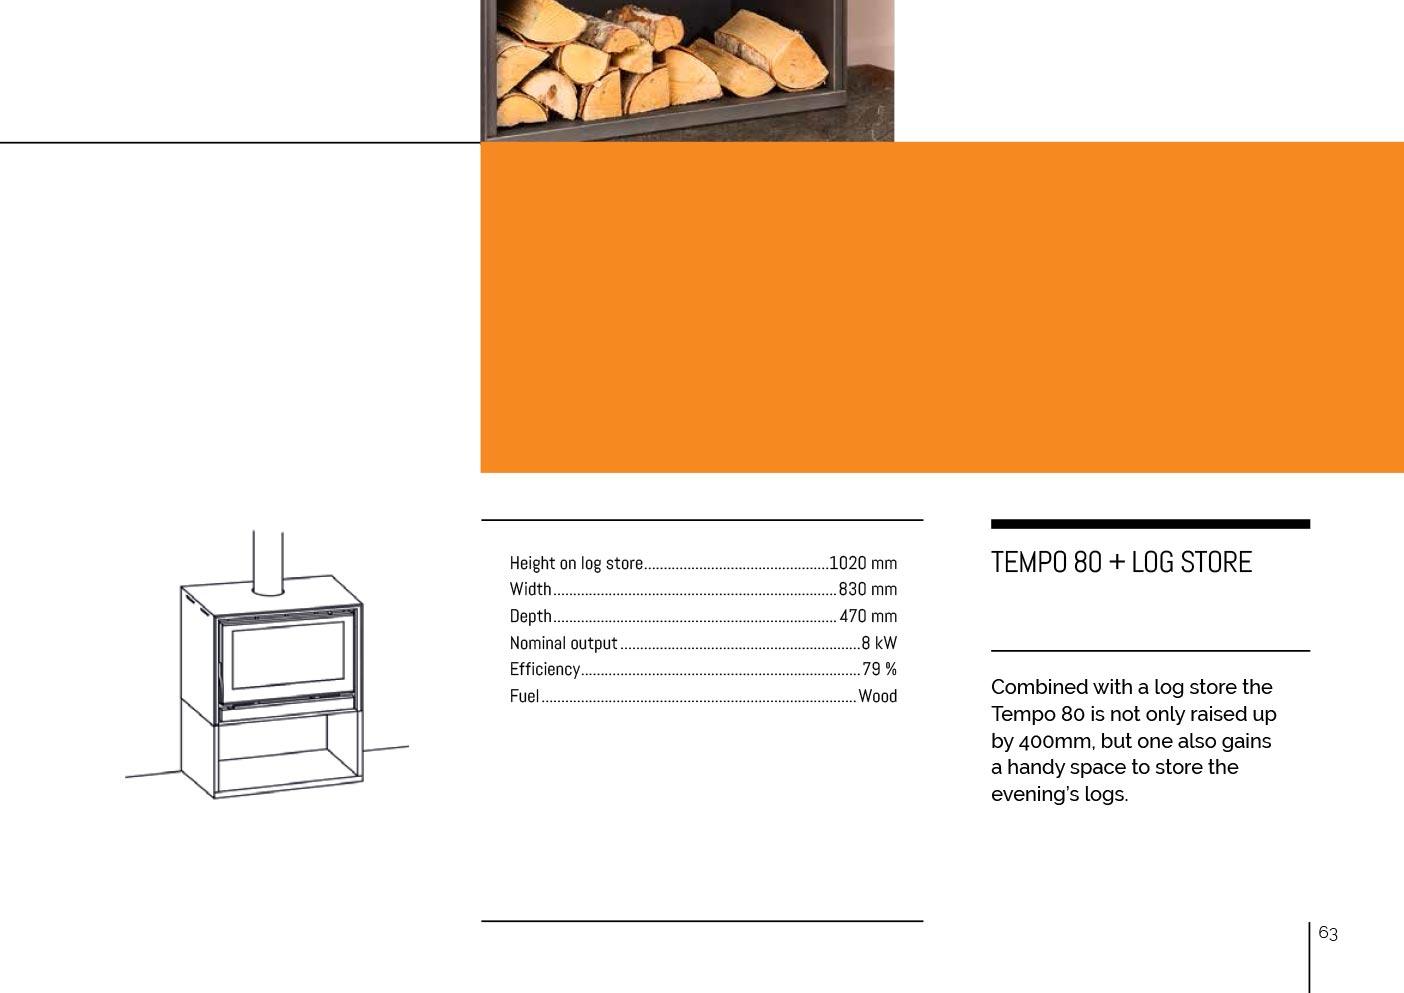 opus-stoves-brochure-(2)-63